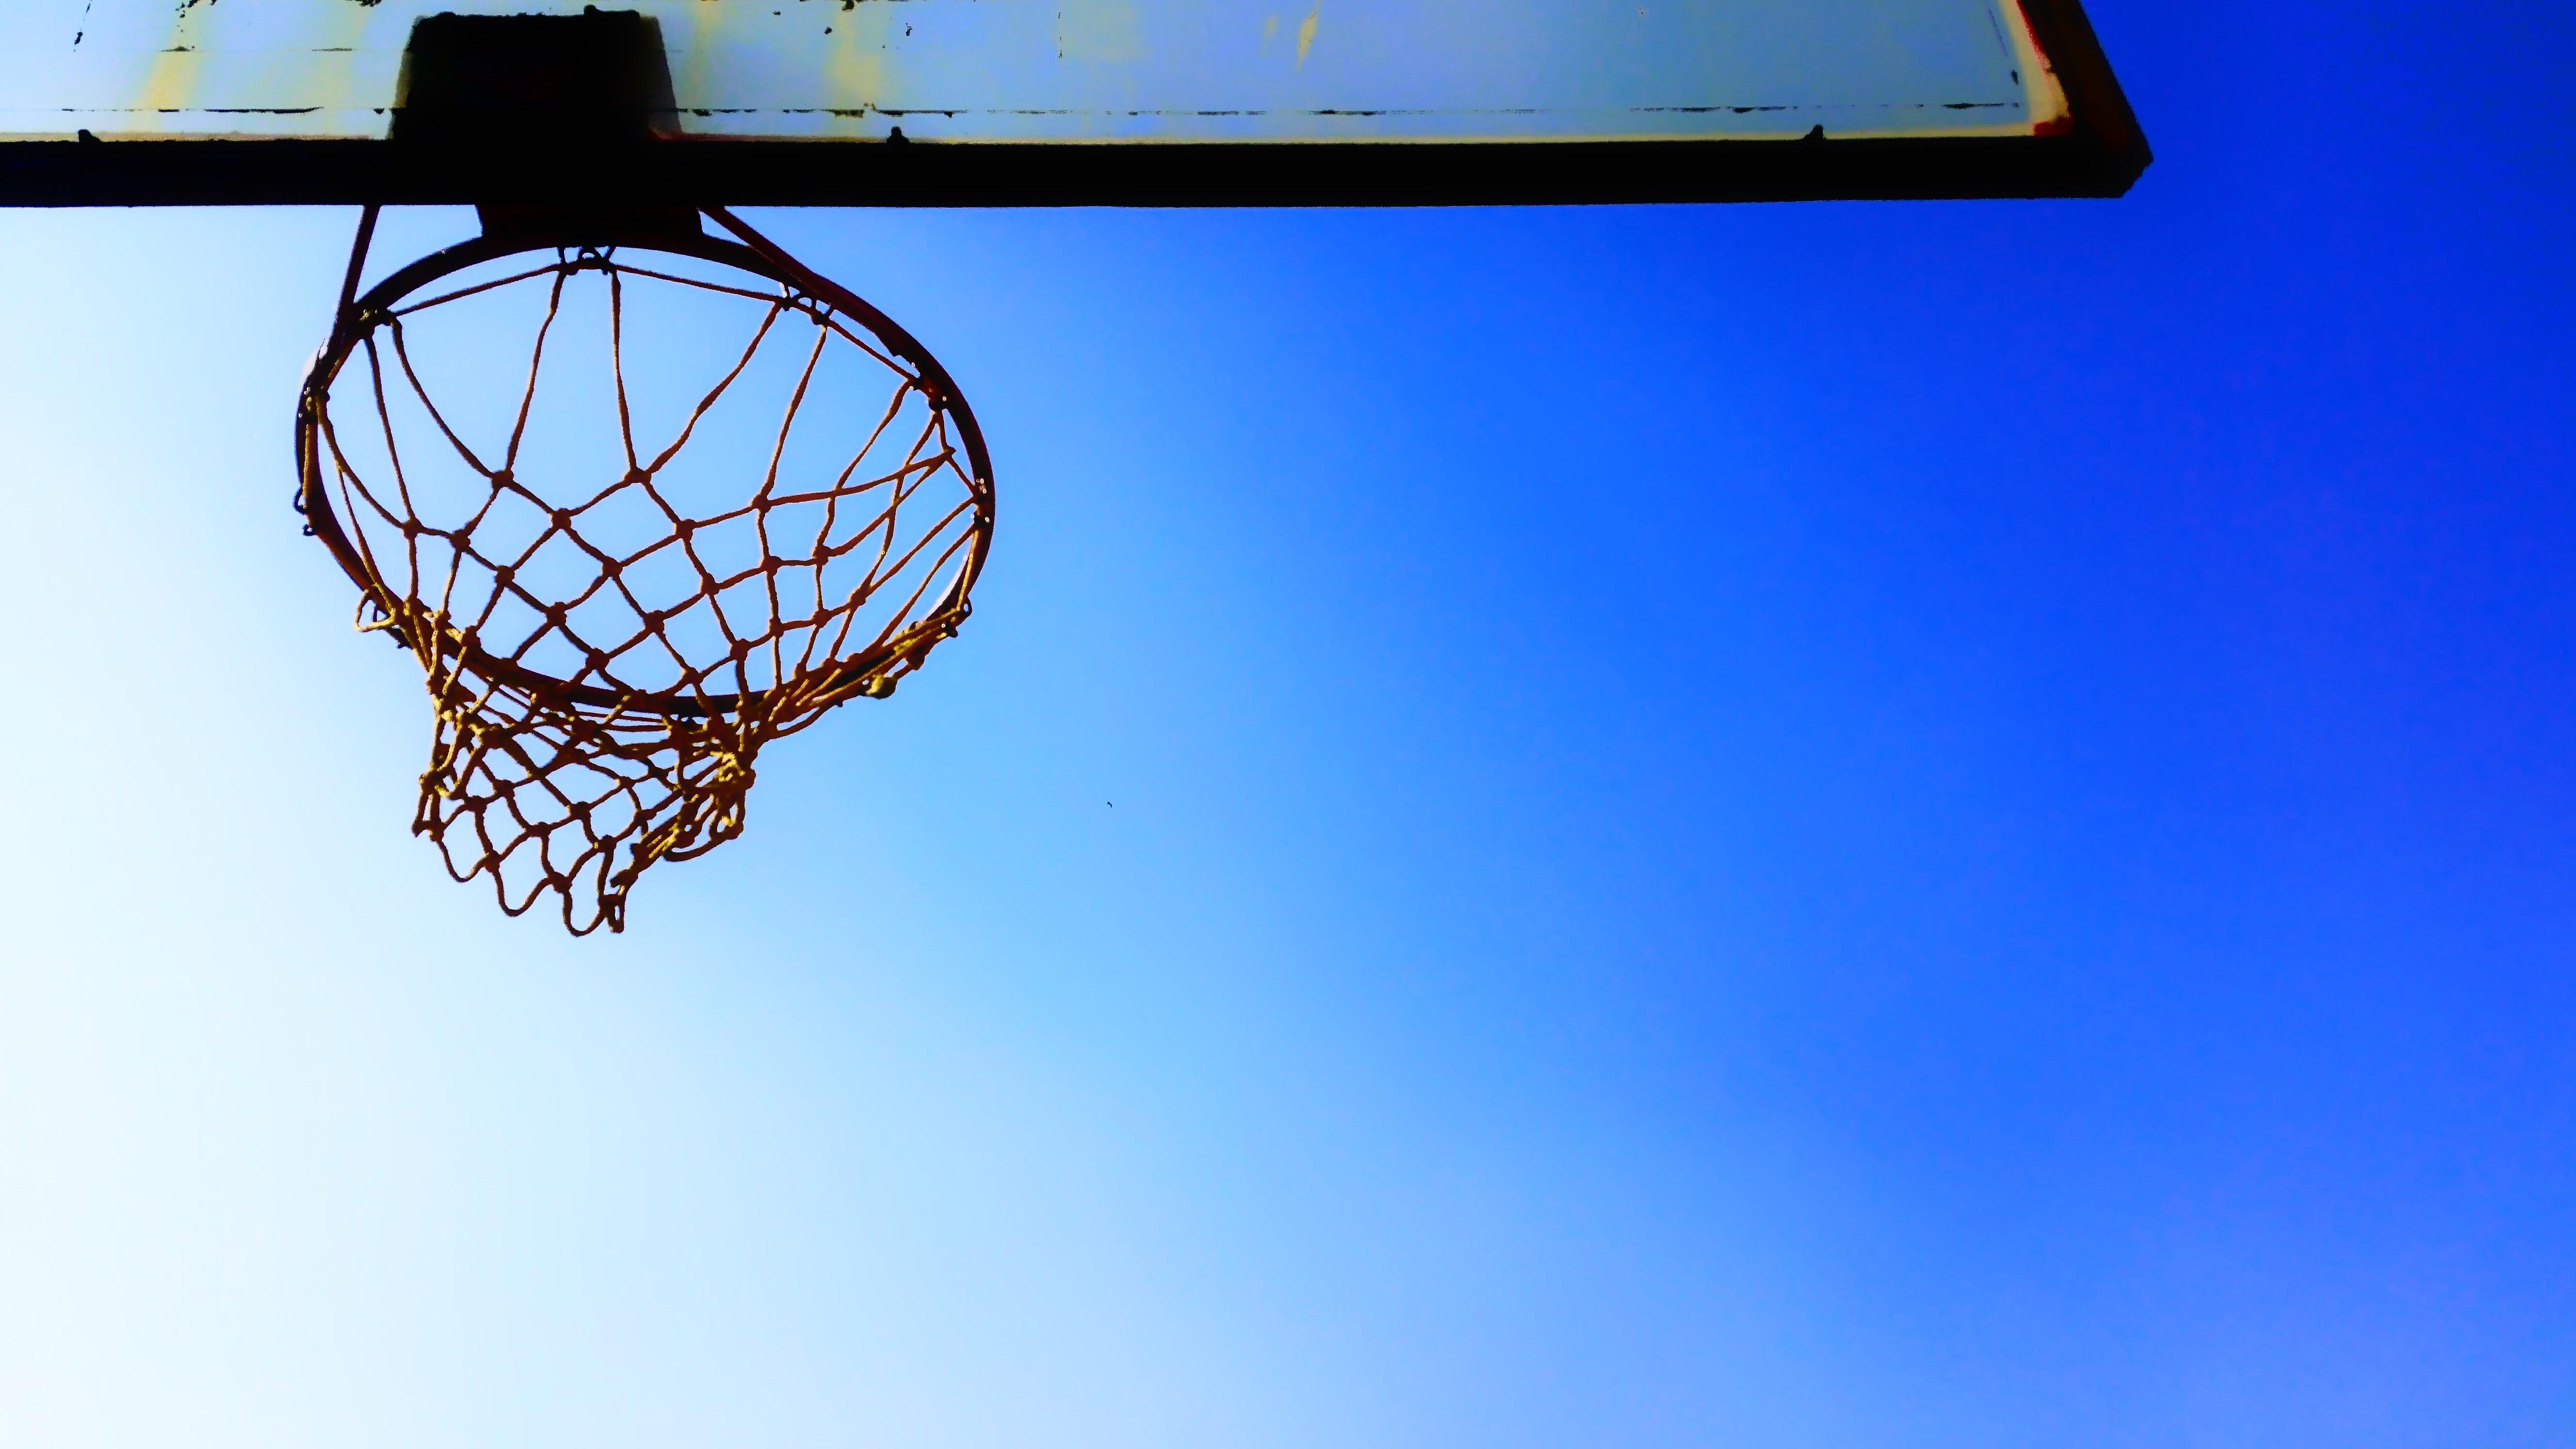 free stock photo of basketball hoop blue sky clear sky